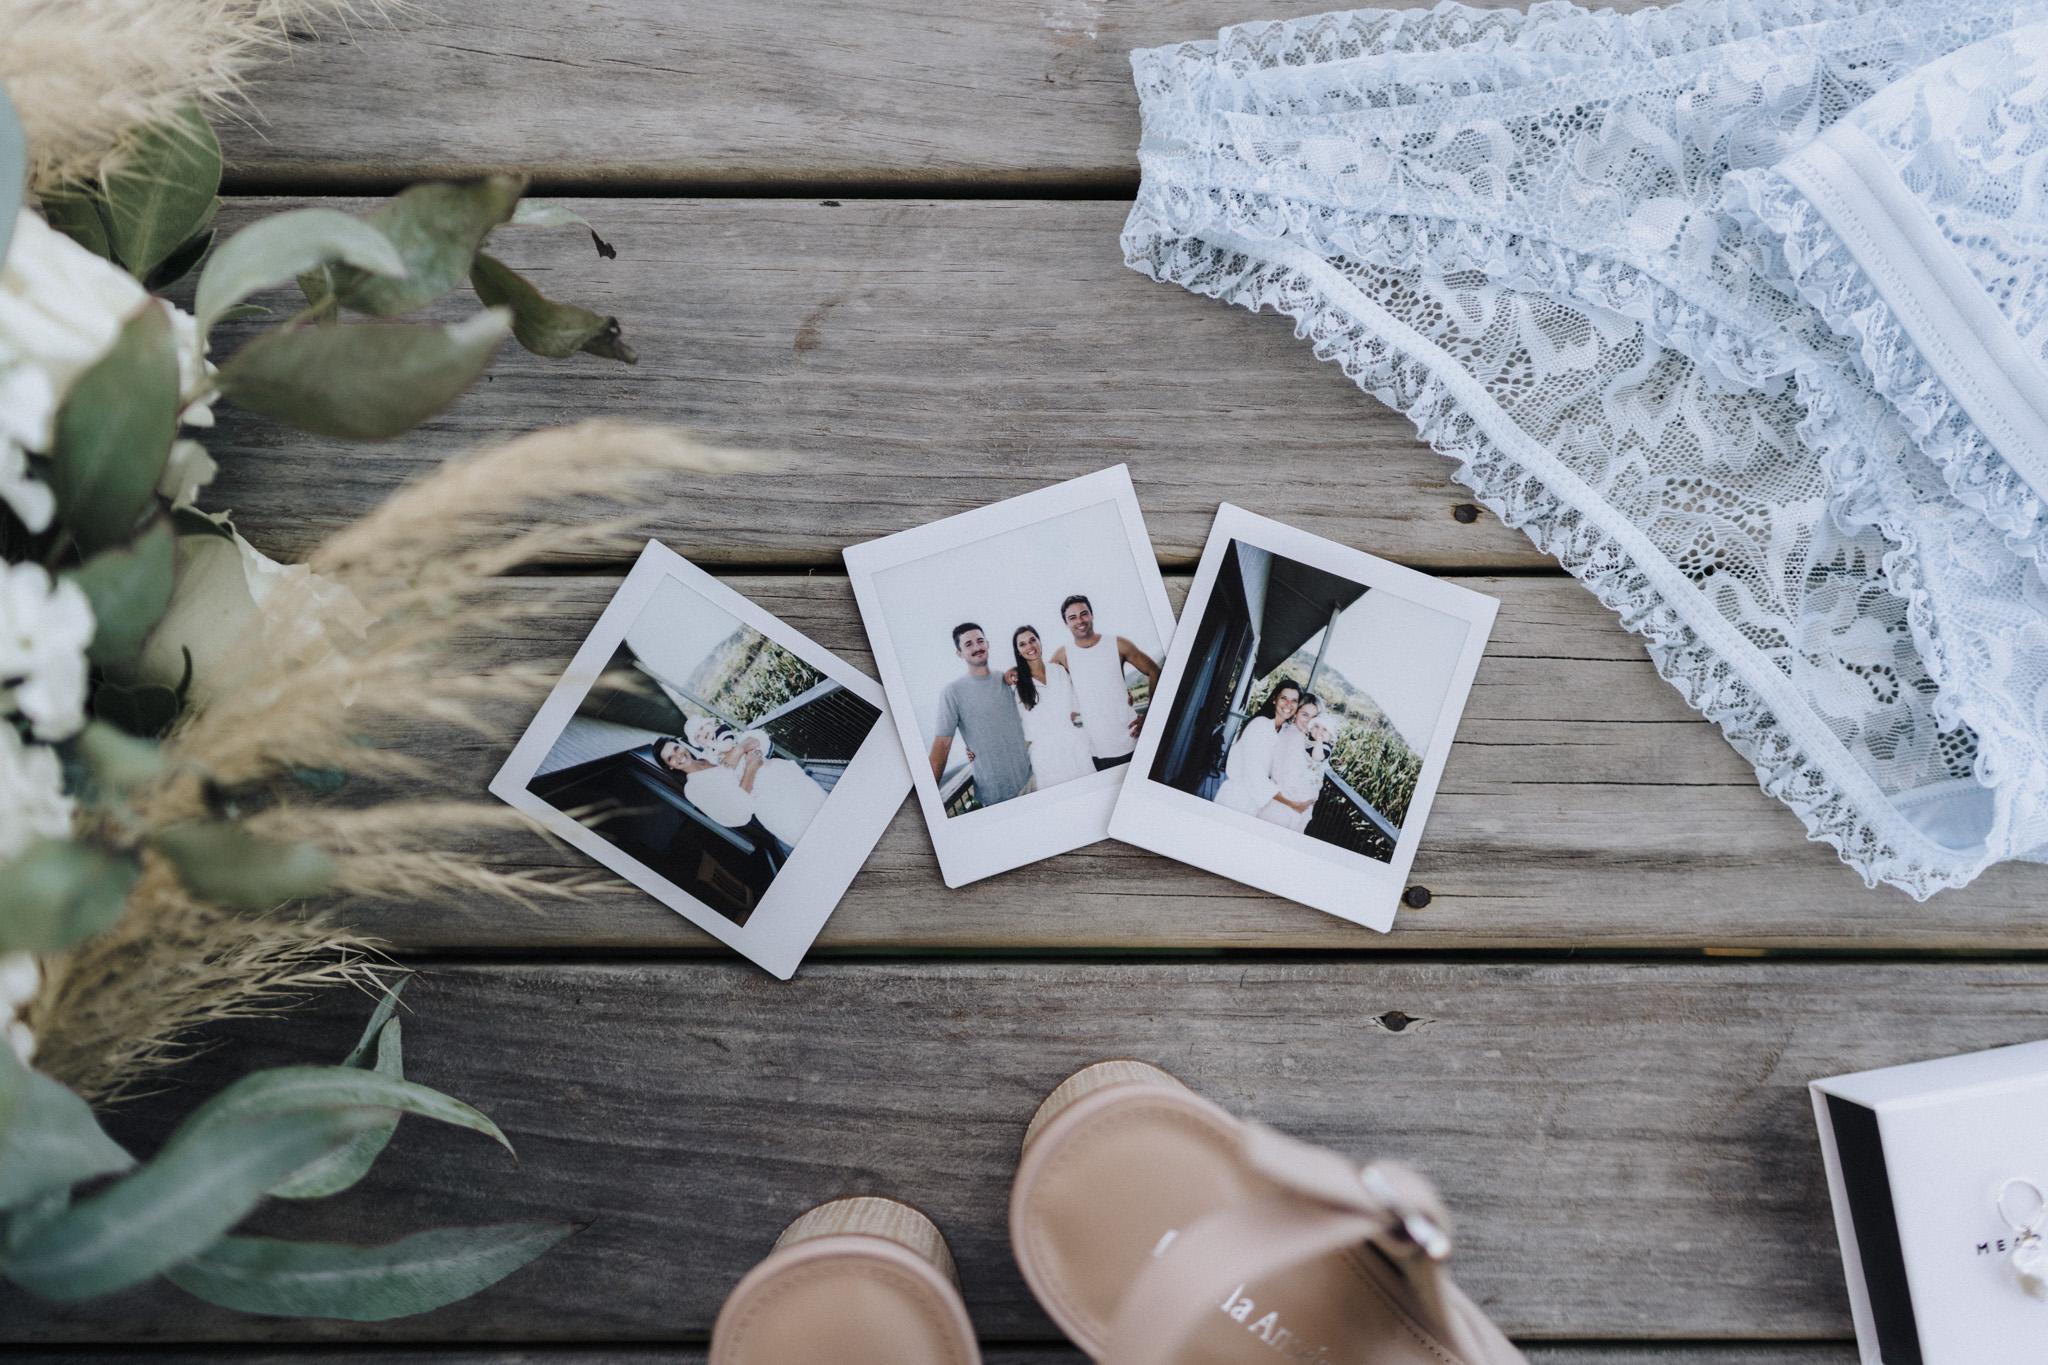 newfound-h-m-castaways-waiuku-auckland-wedding-photographer-17